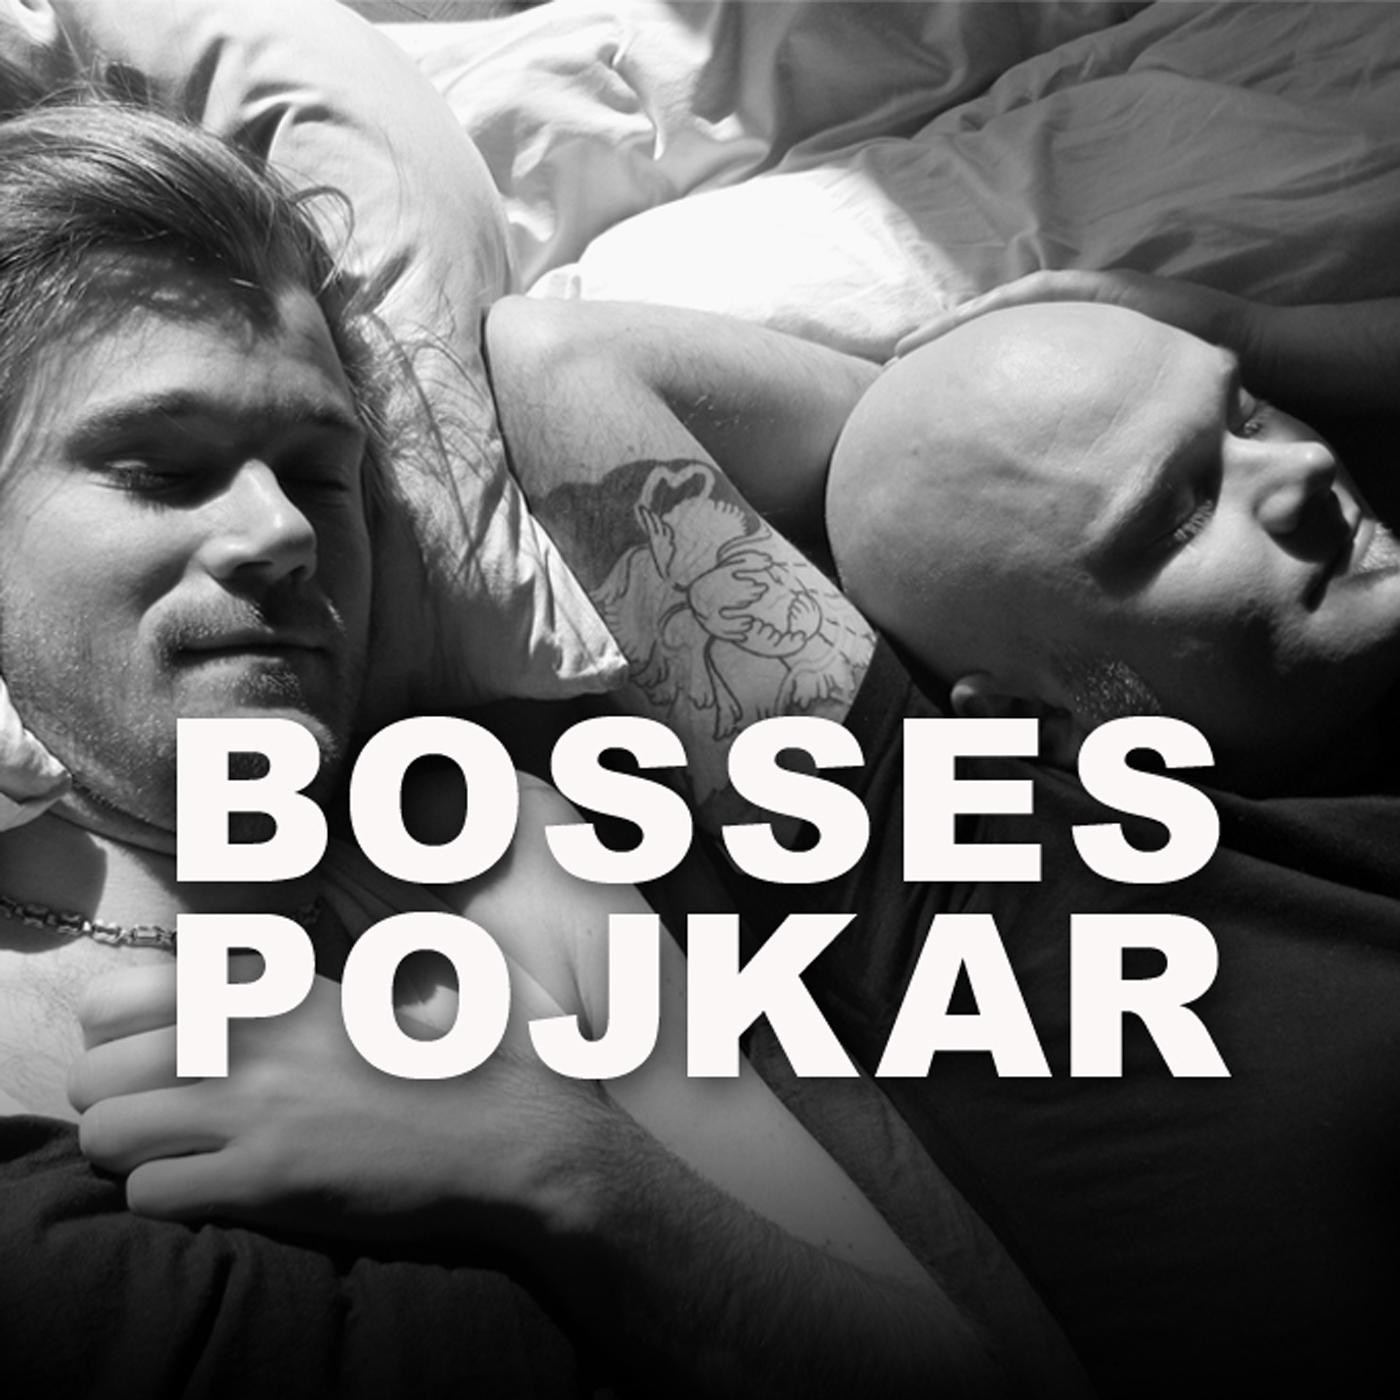 Bosses Pojkar